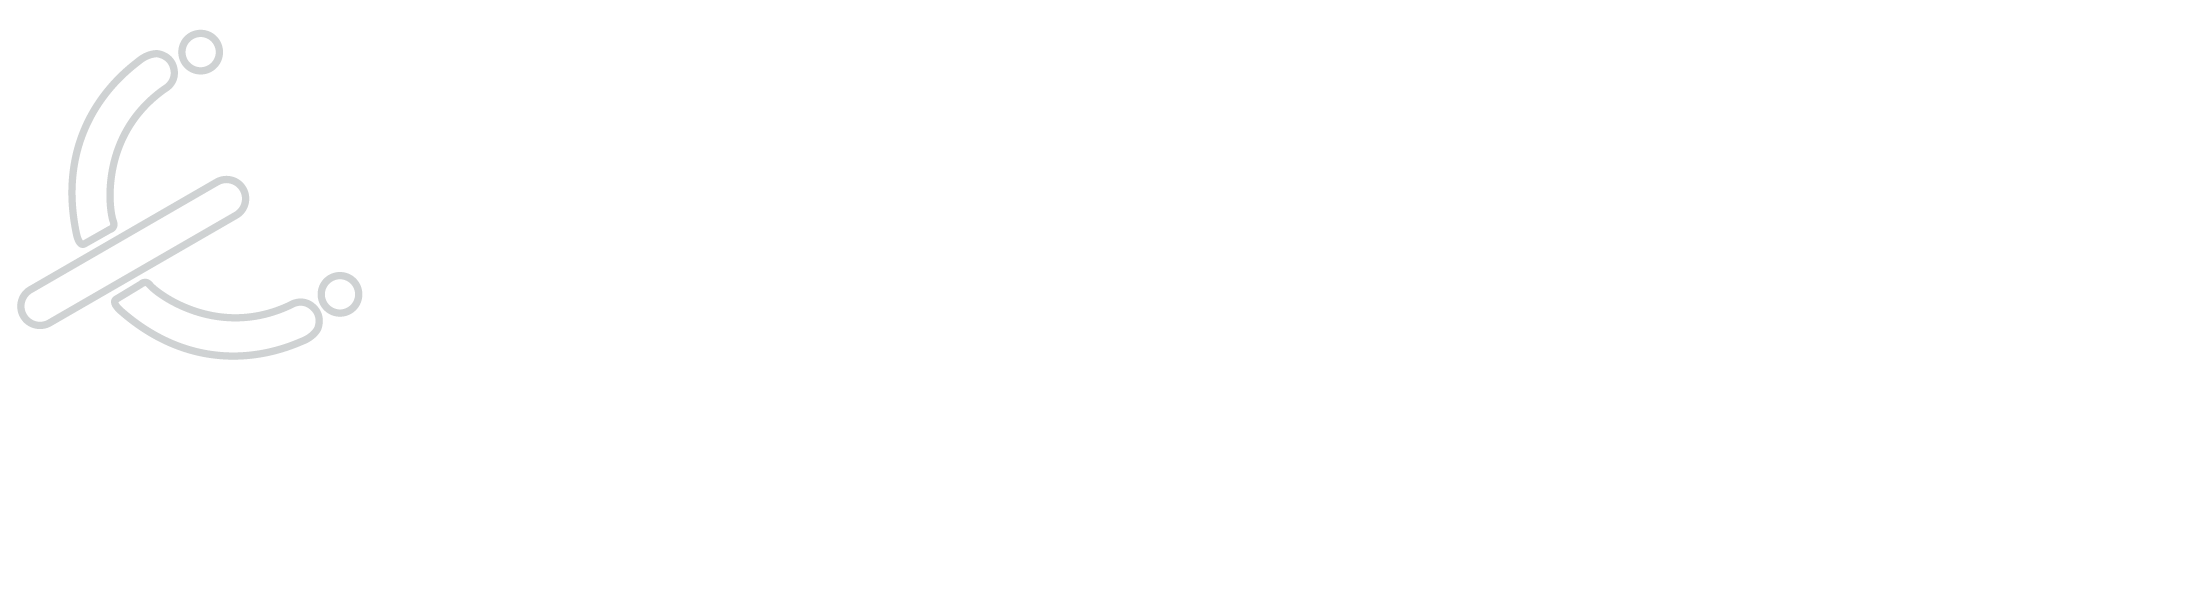 Logo ekomercio blanco